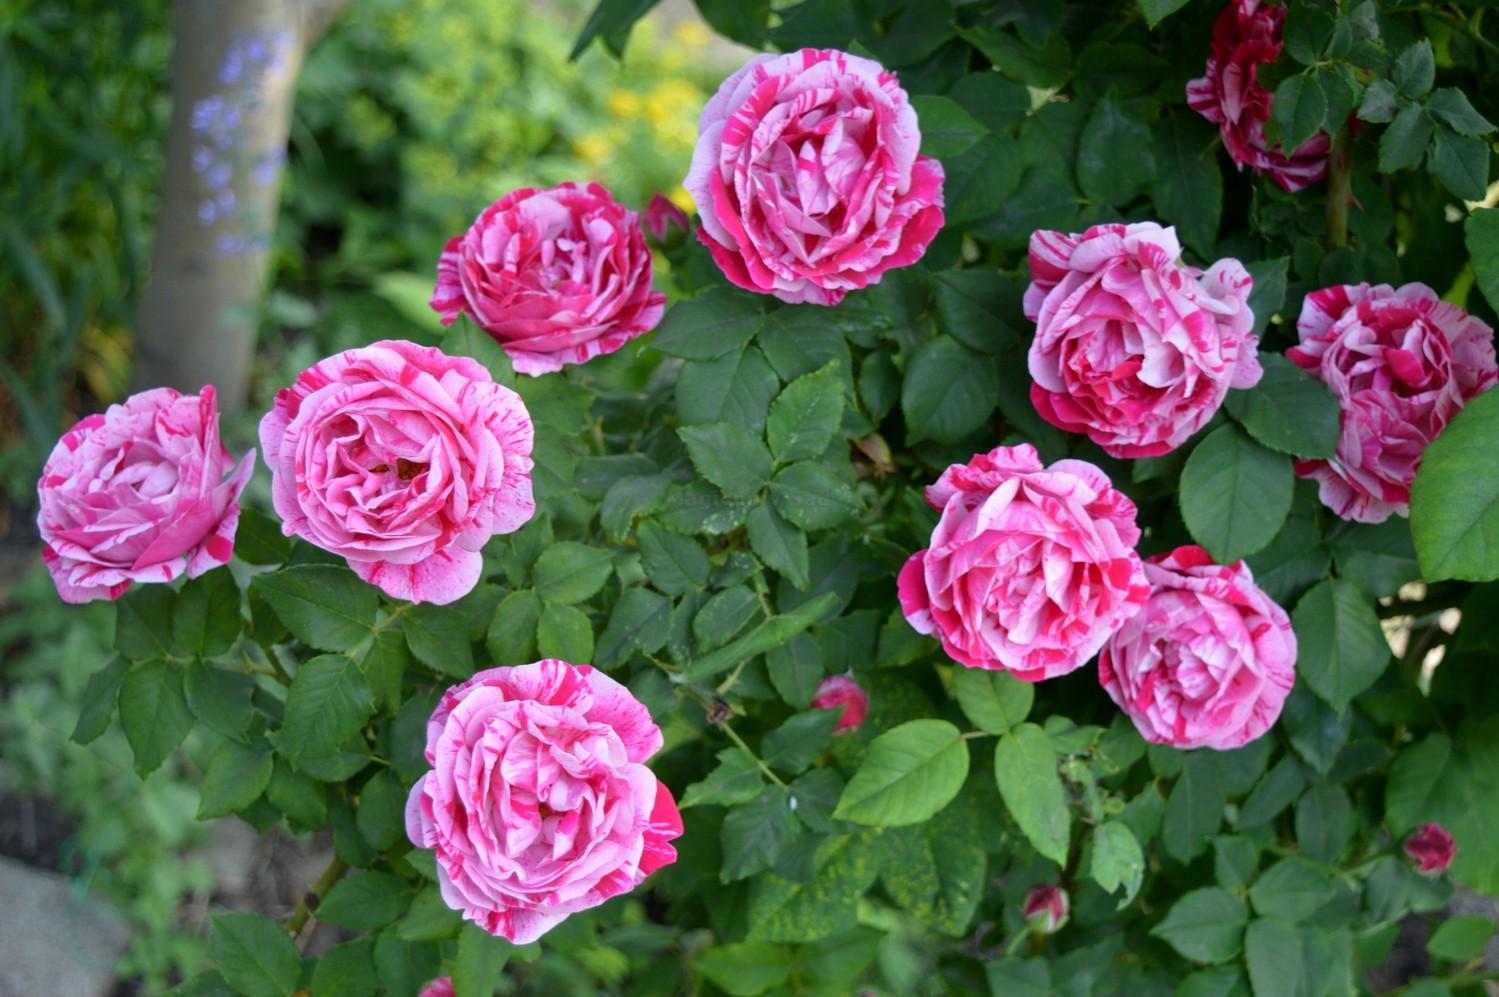 paraziți cu șolduri de trandafiri complet recuperat din negi genitale